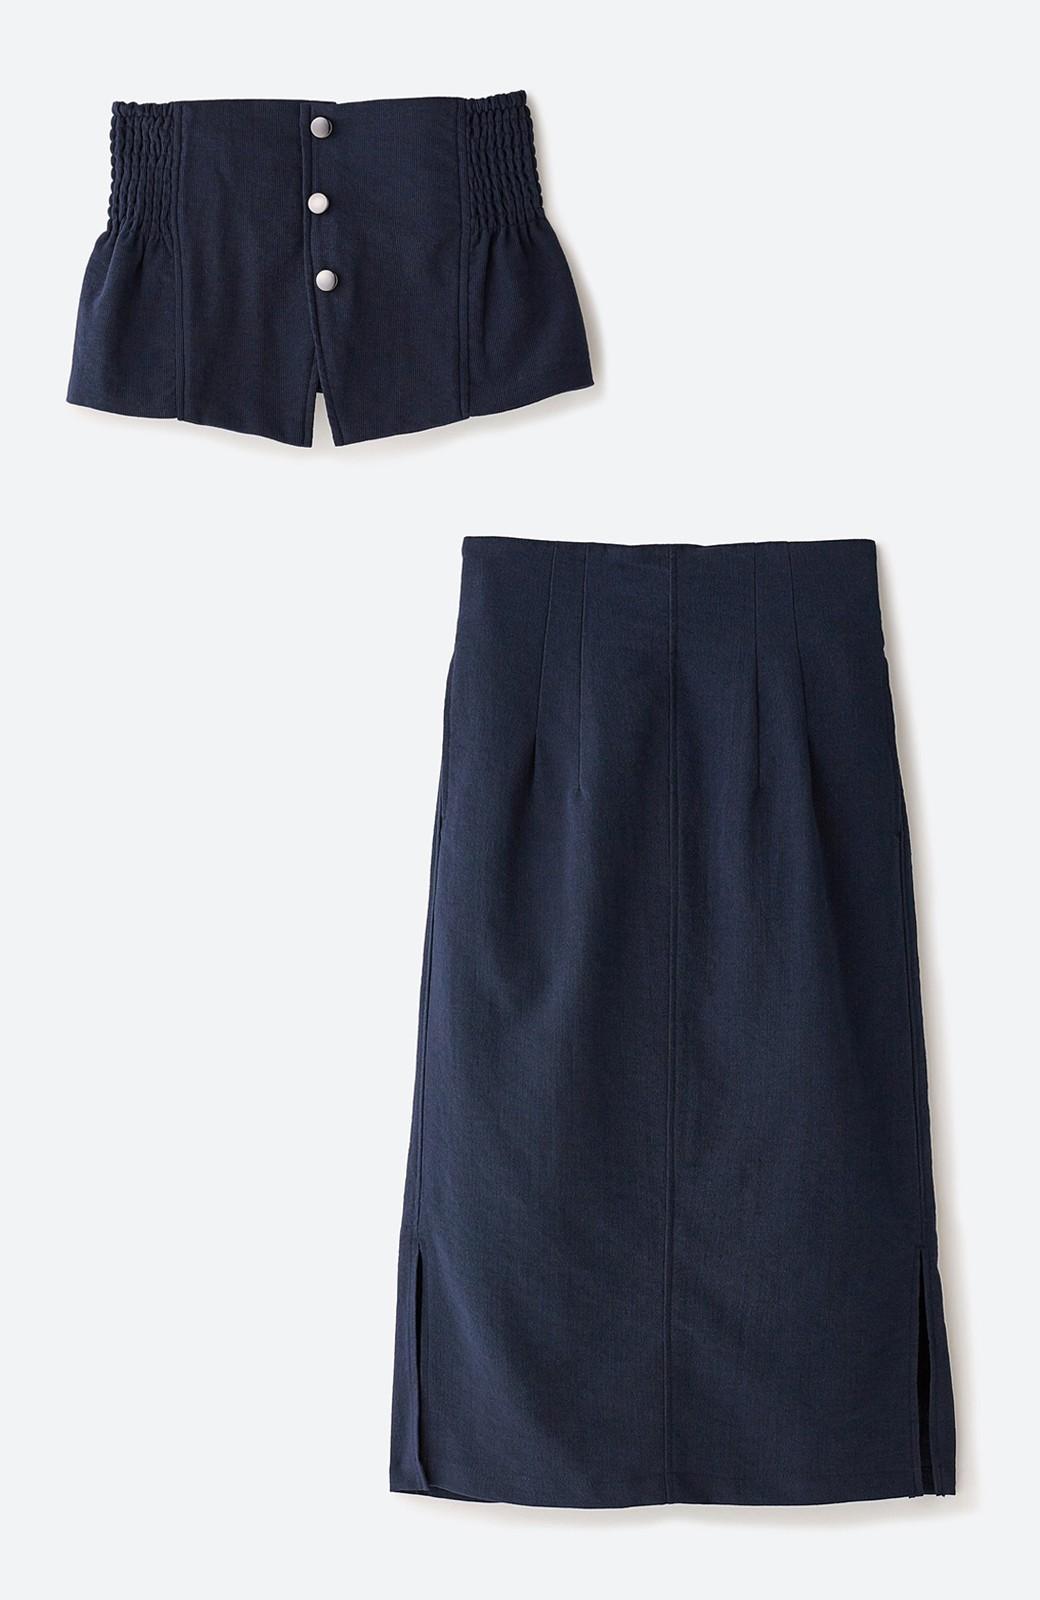 haco!  腹巻きとは呼ばせない ブルー期も華やかに過ごせる消臭加工裏地付きフリルデザインスカートセット【ブルー期】女の子バンザイ!プロジェクト <ネイビー>の商品写真1